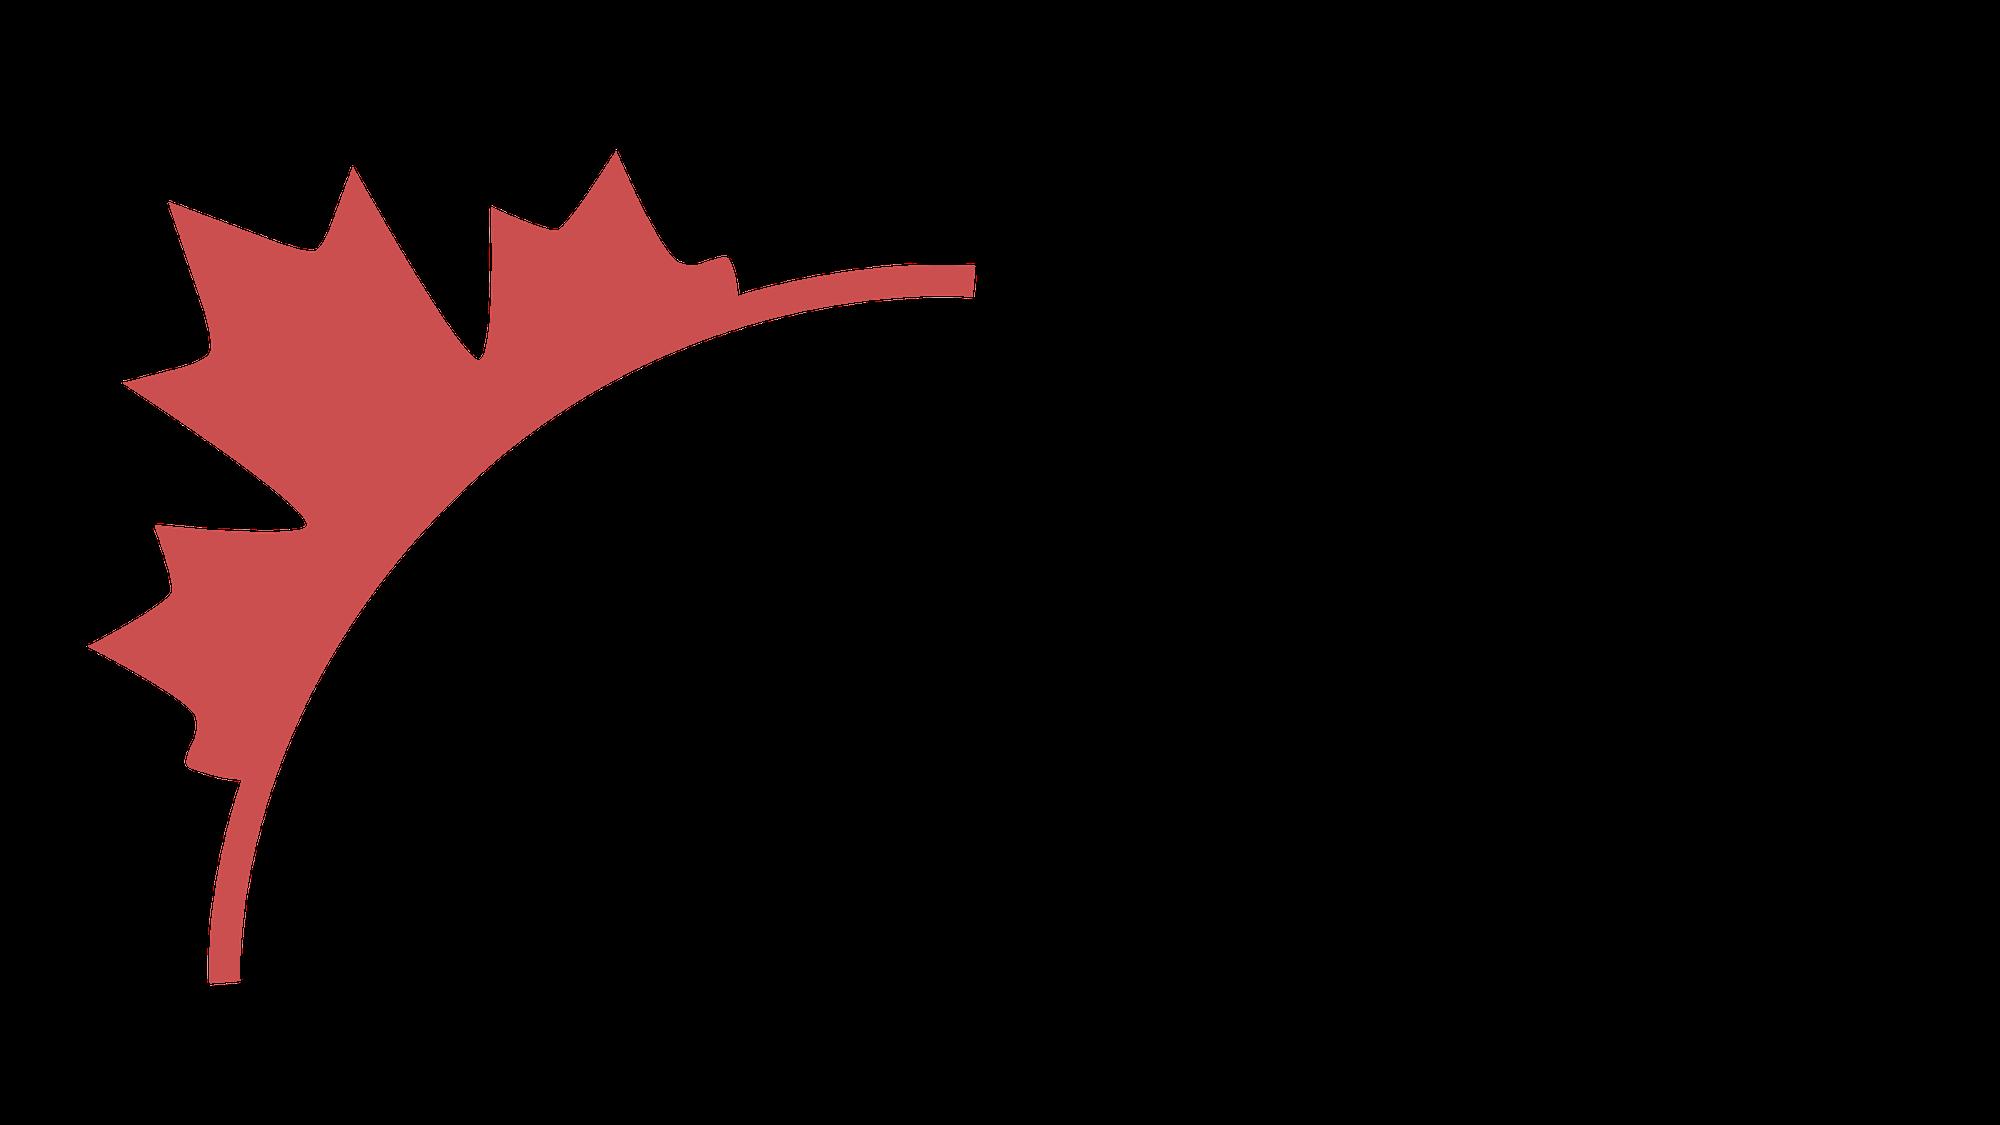 cfia-acia-logo-png-transparent